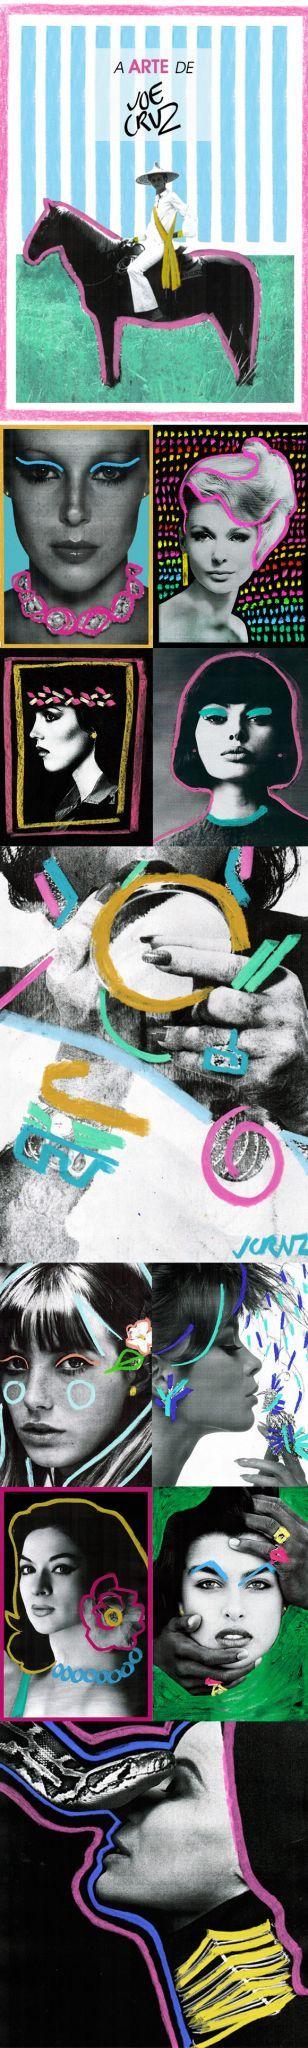 Achados da Bia | Arte | Joe Cruz